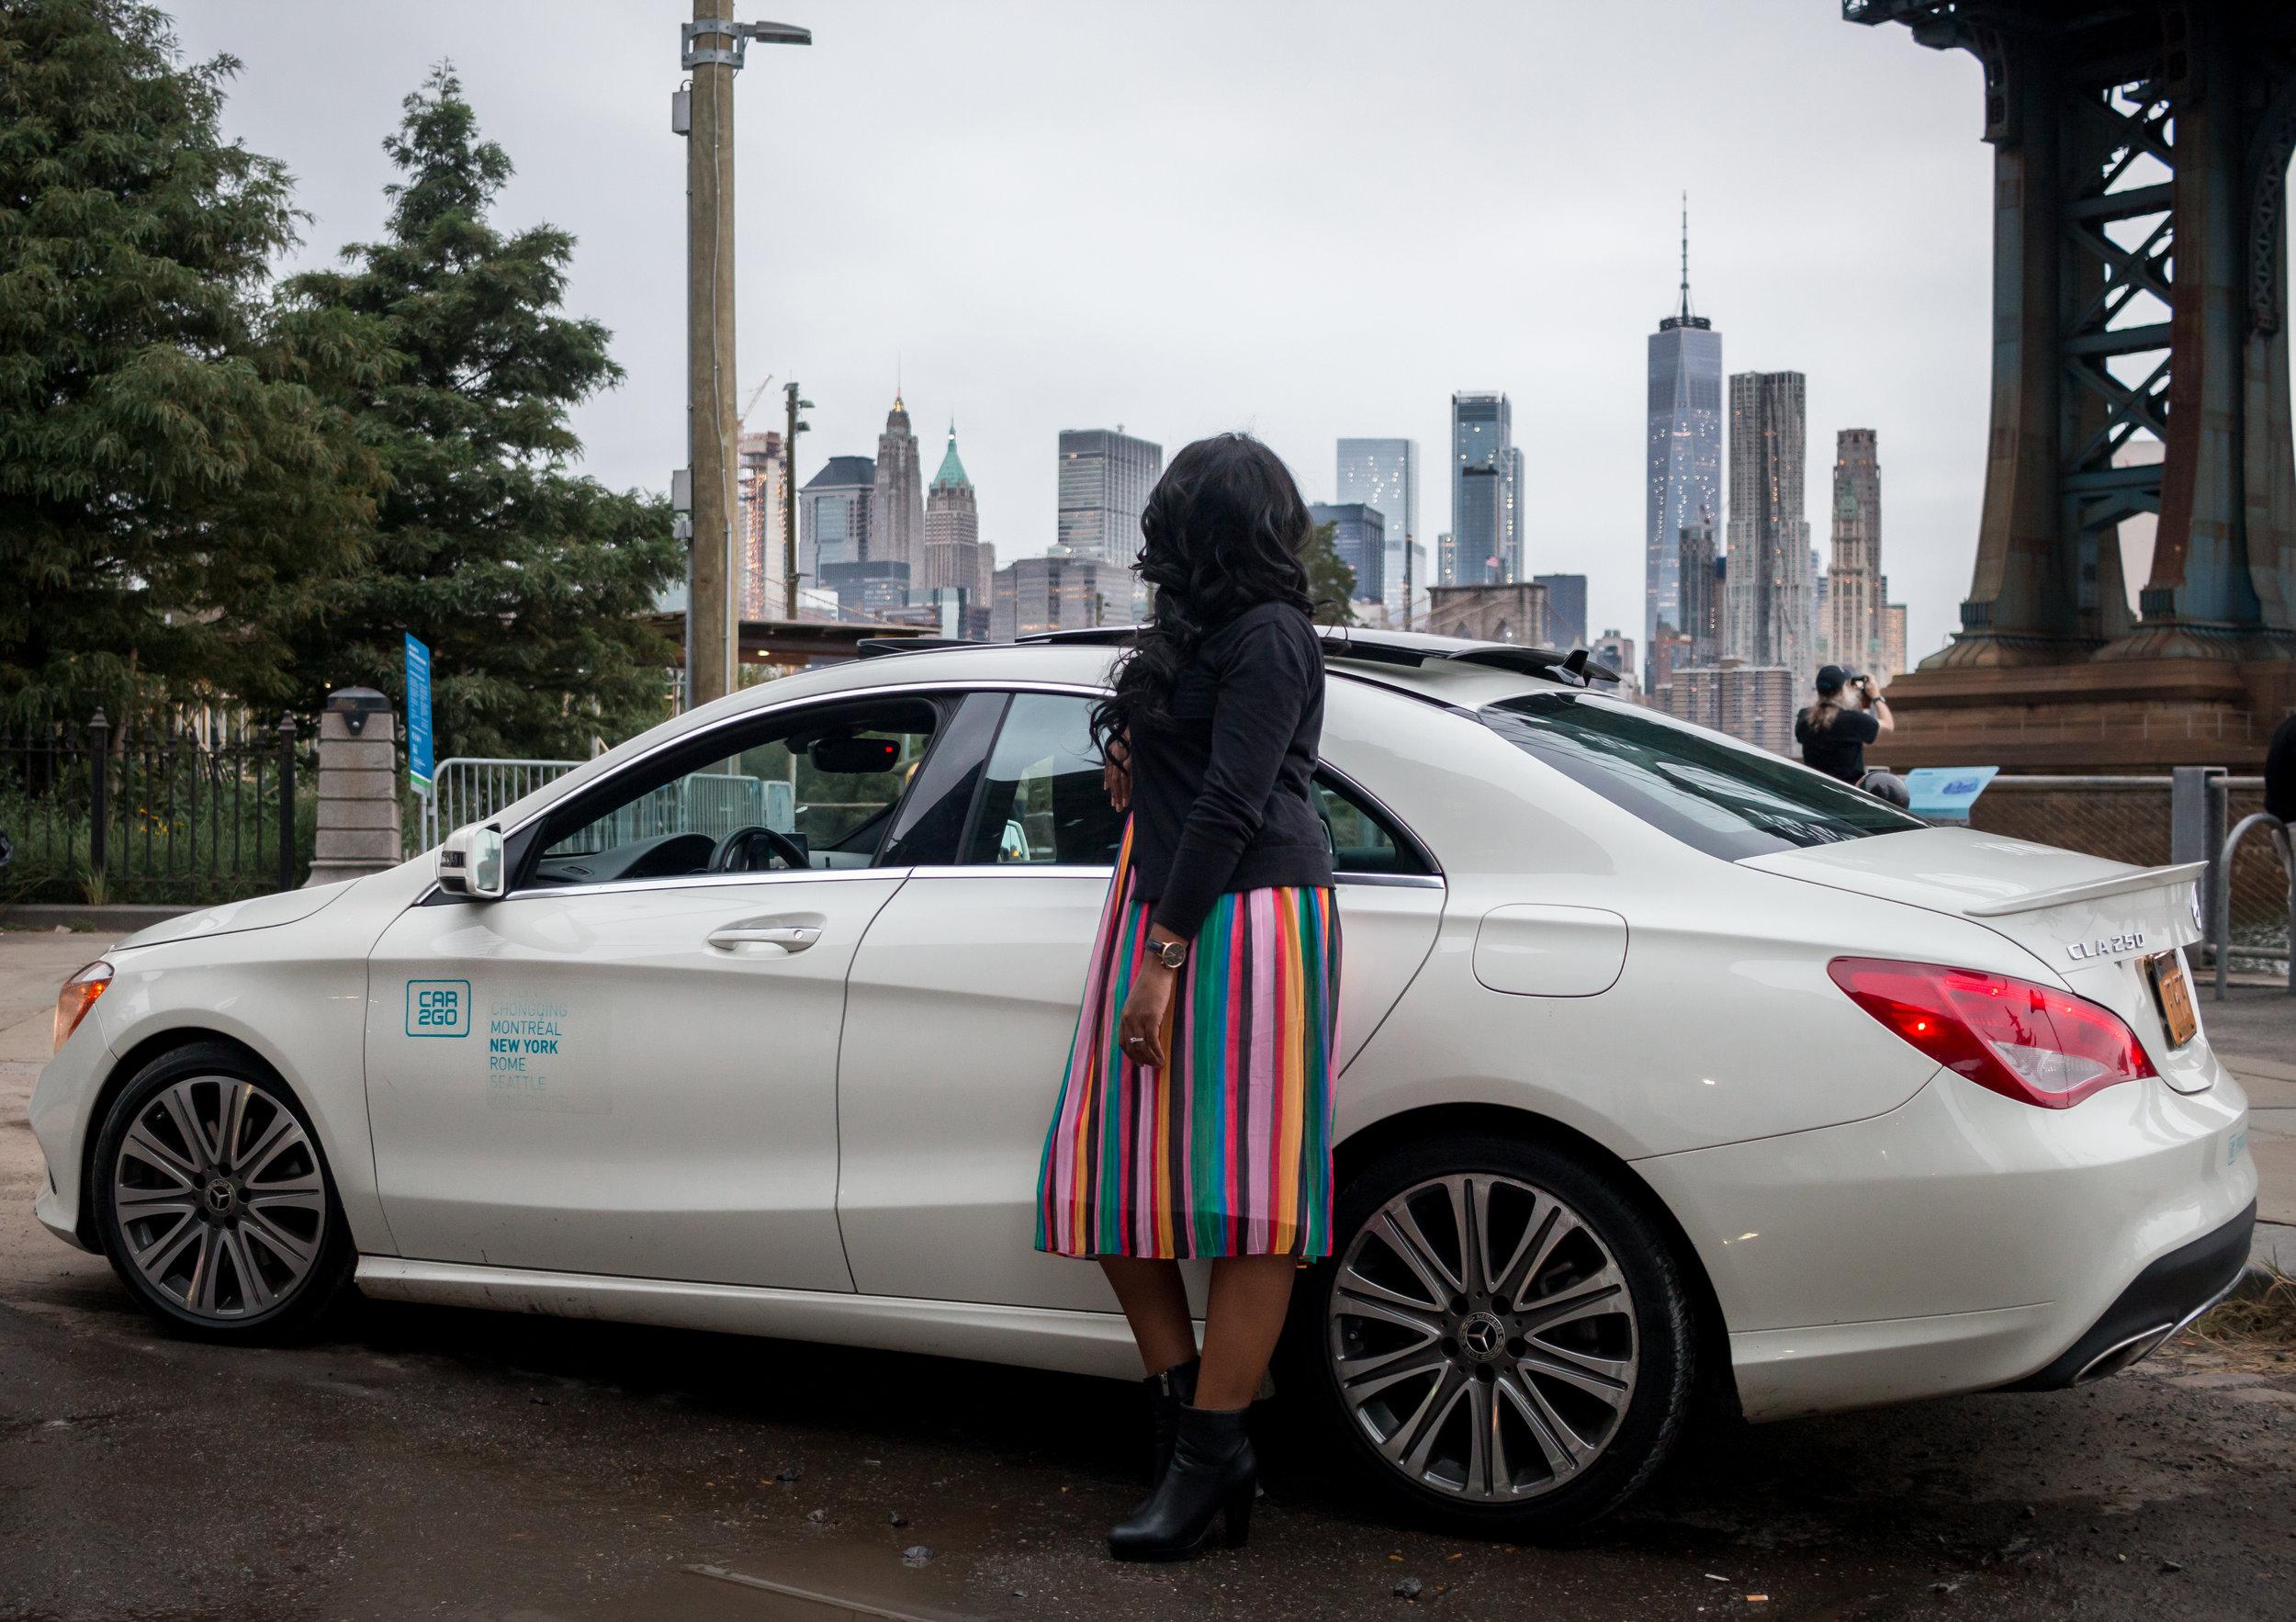 car2go-brooklyn-new-york-city-view-mercedes-benz-cla